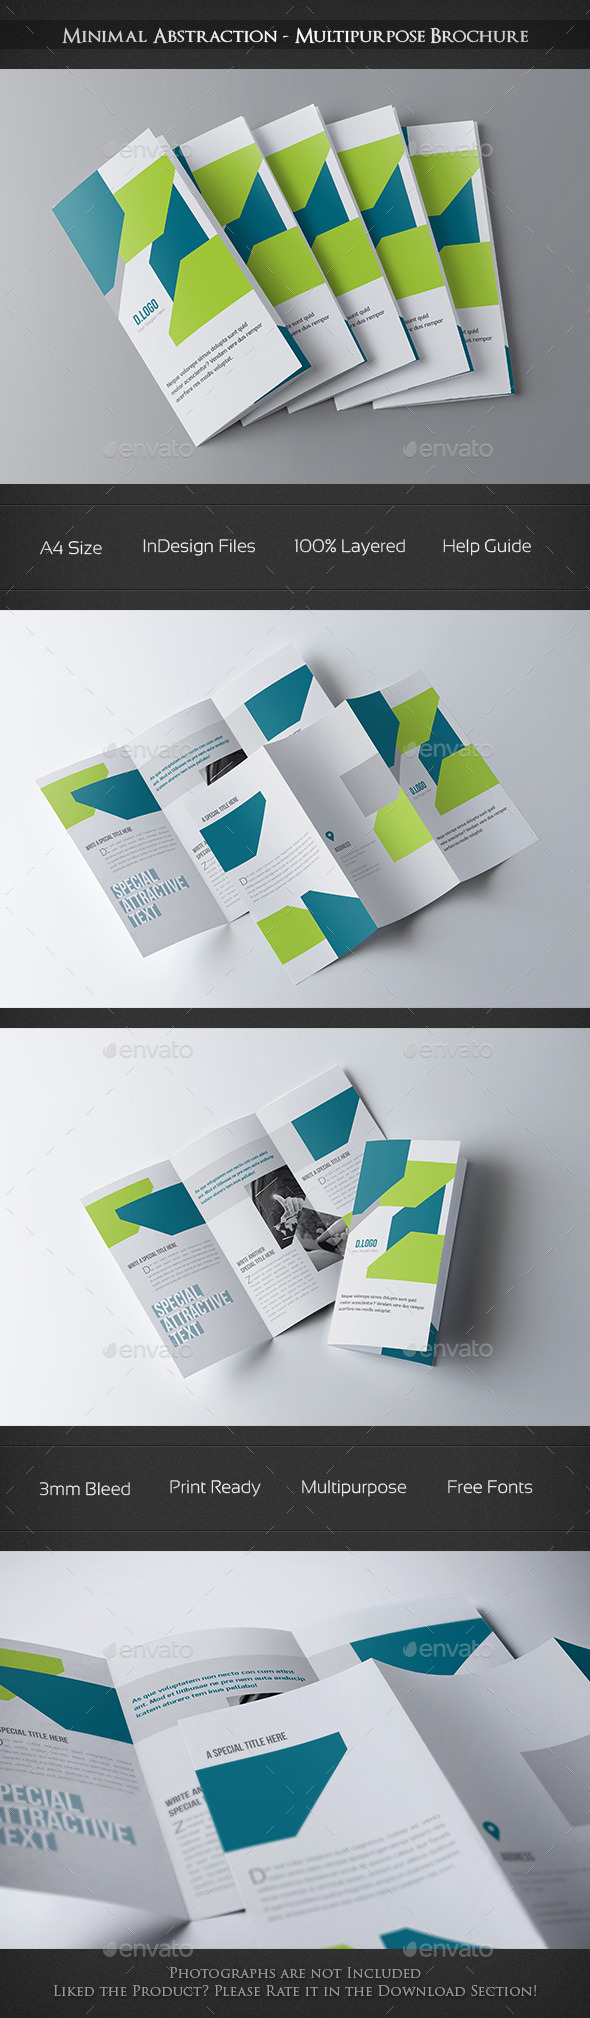 Minimal Abstraction - Multipurpose Brochure - Corporate Brochures